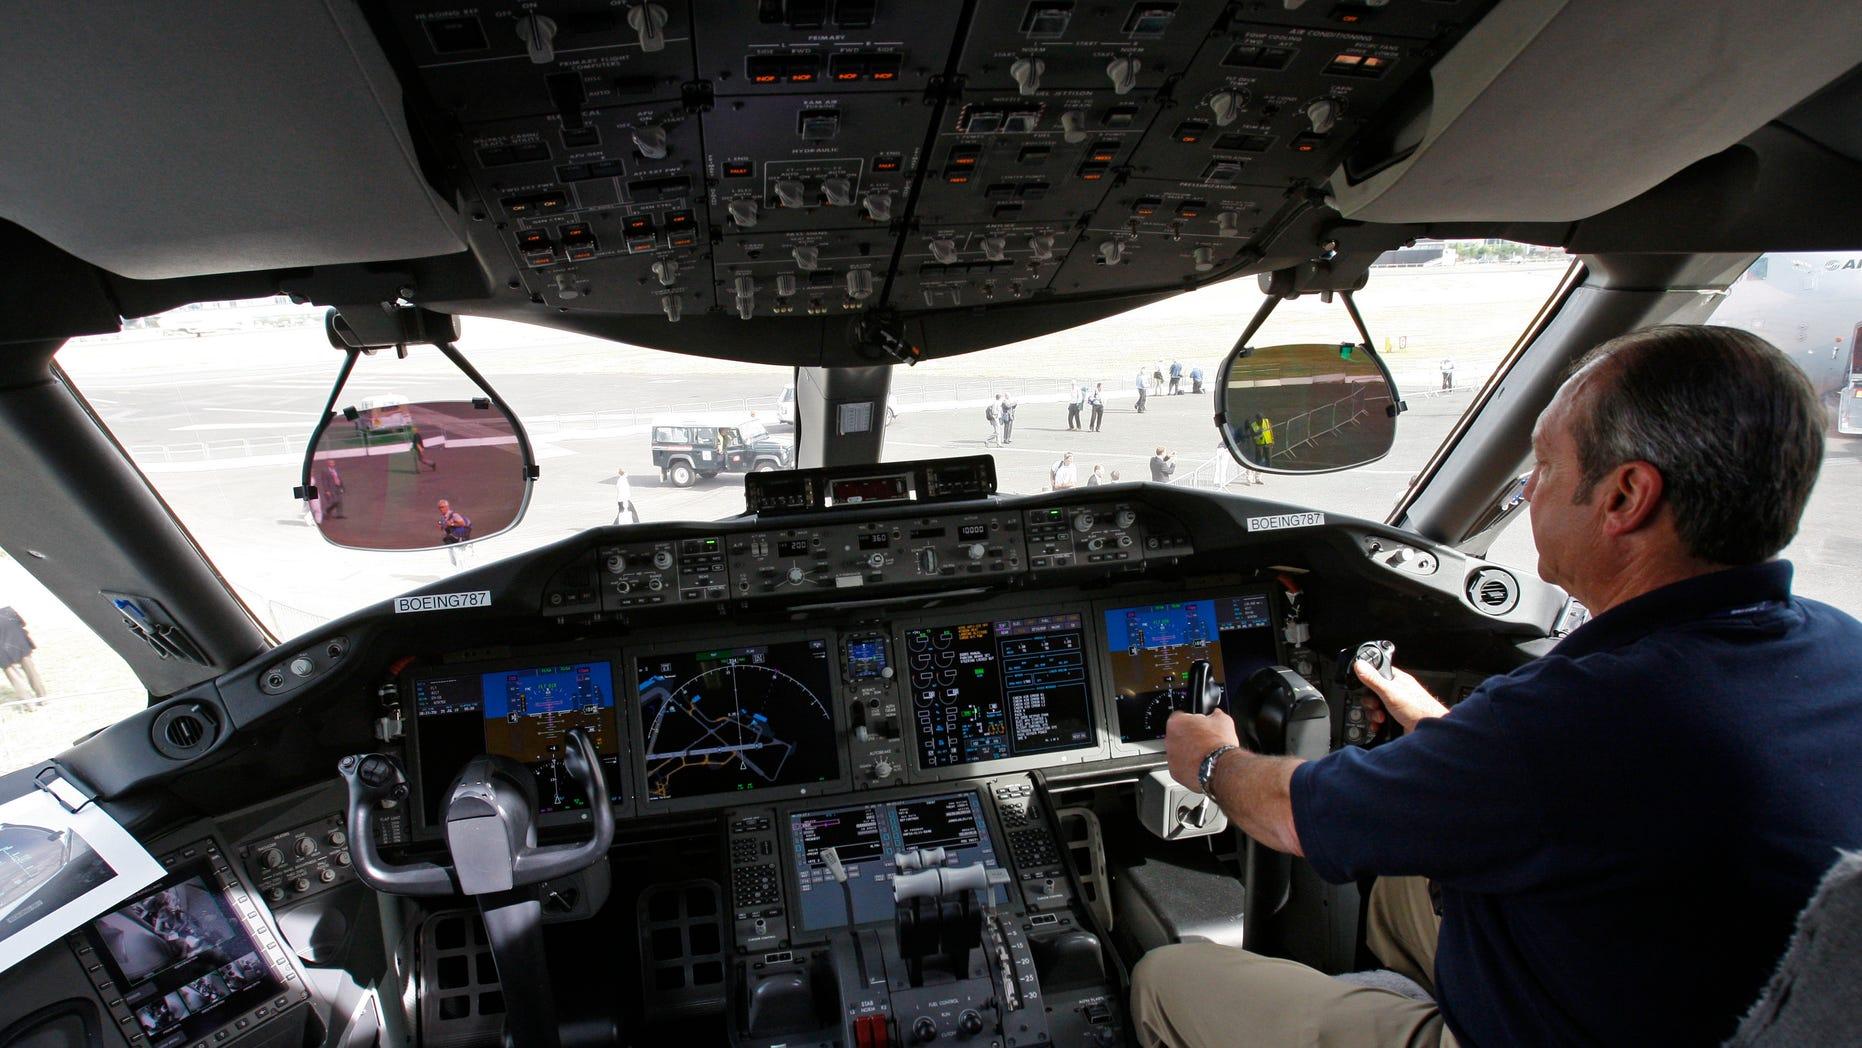 A Boeing 787 cockpit